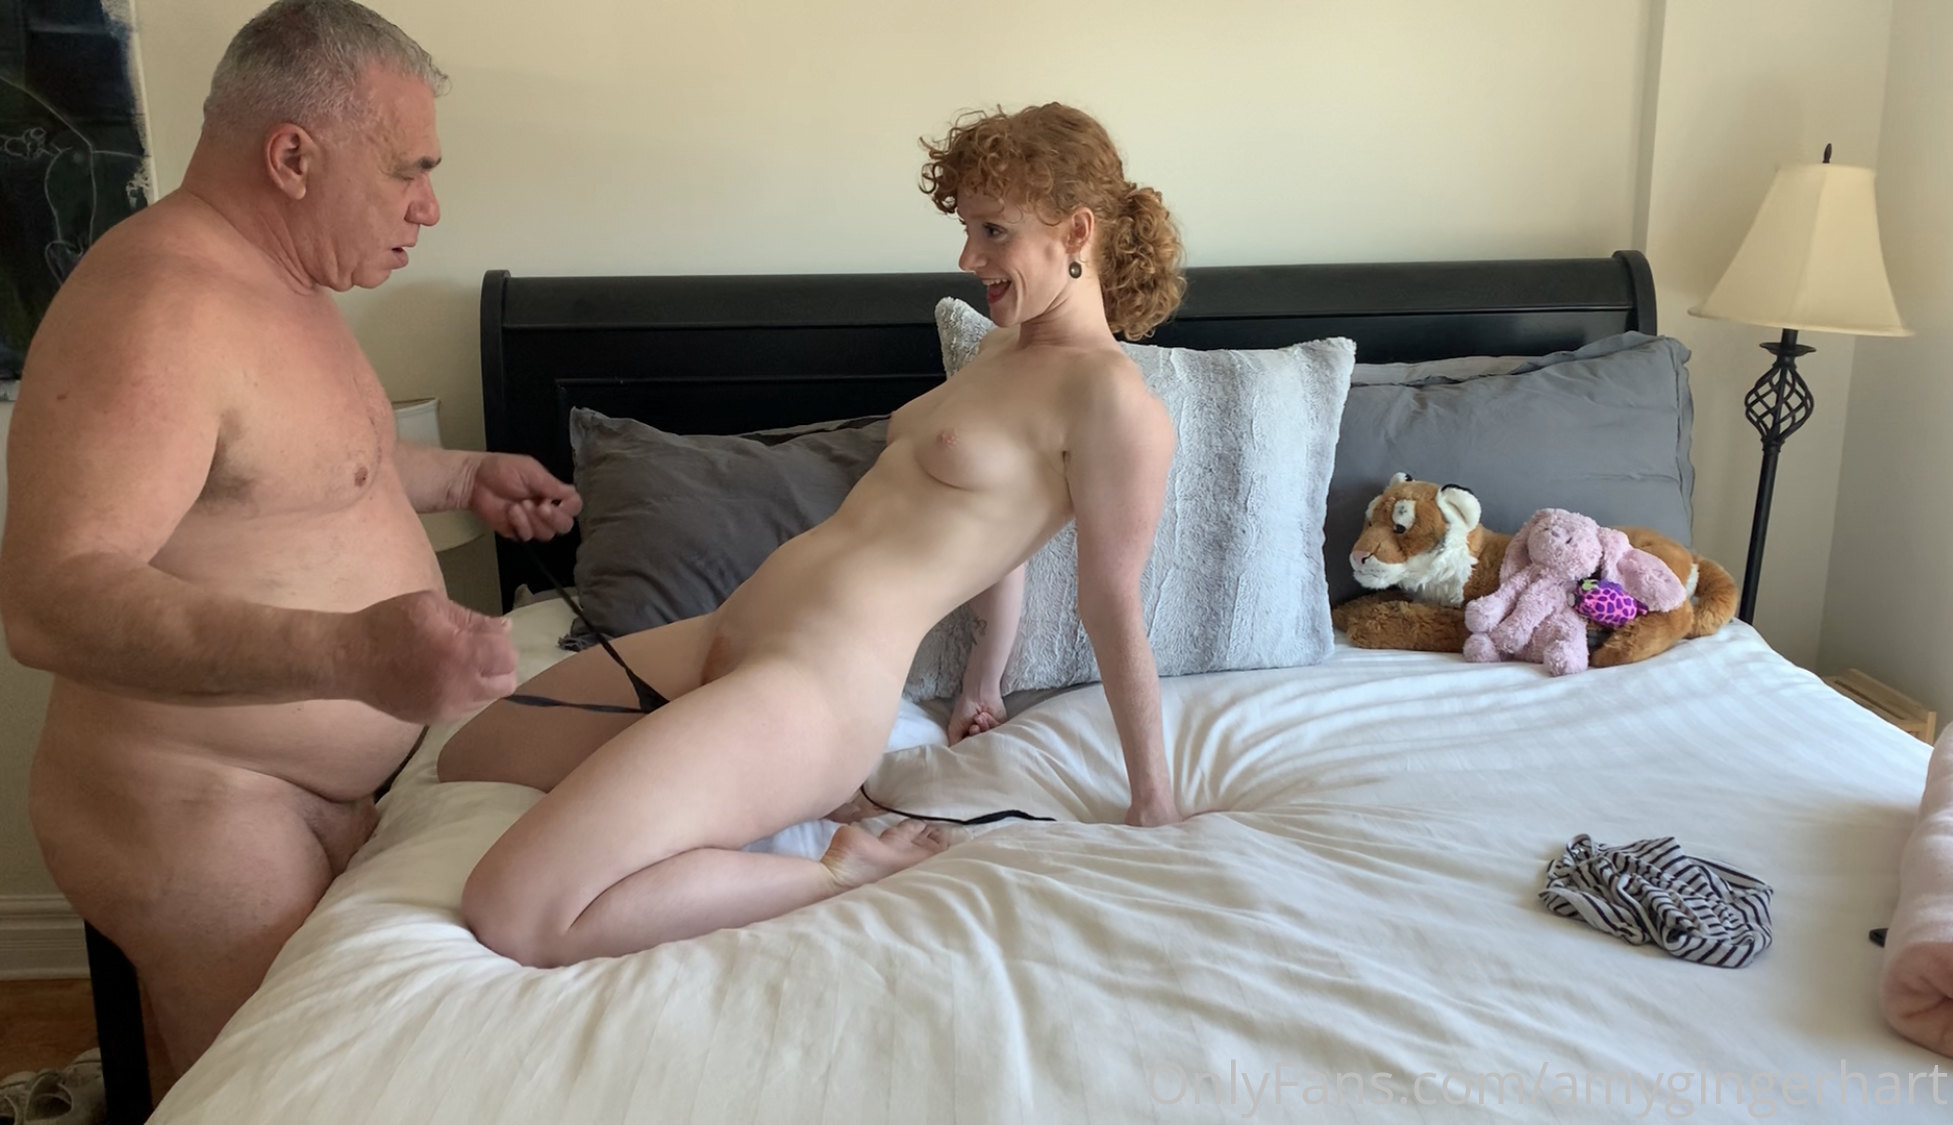 Amy Hart, Amygingerhart, Onlyfans 0254